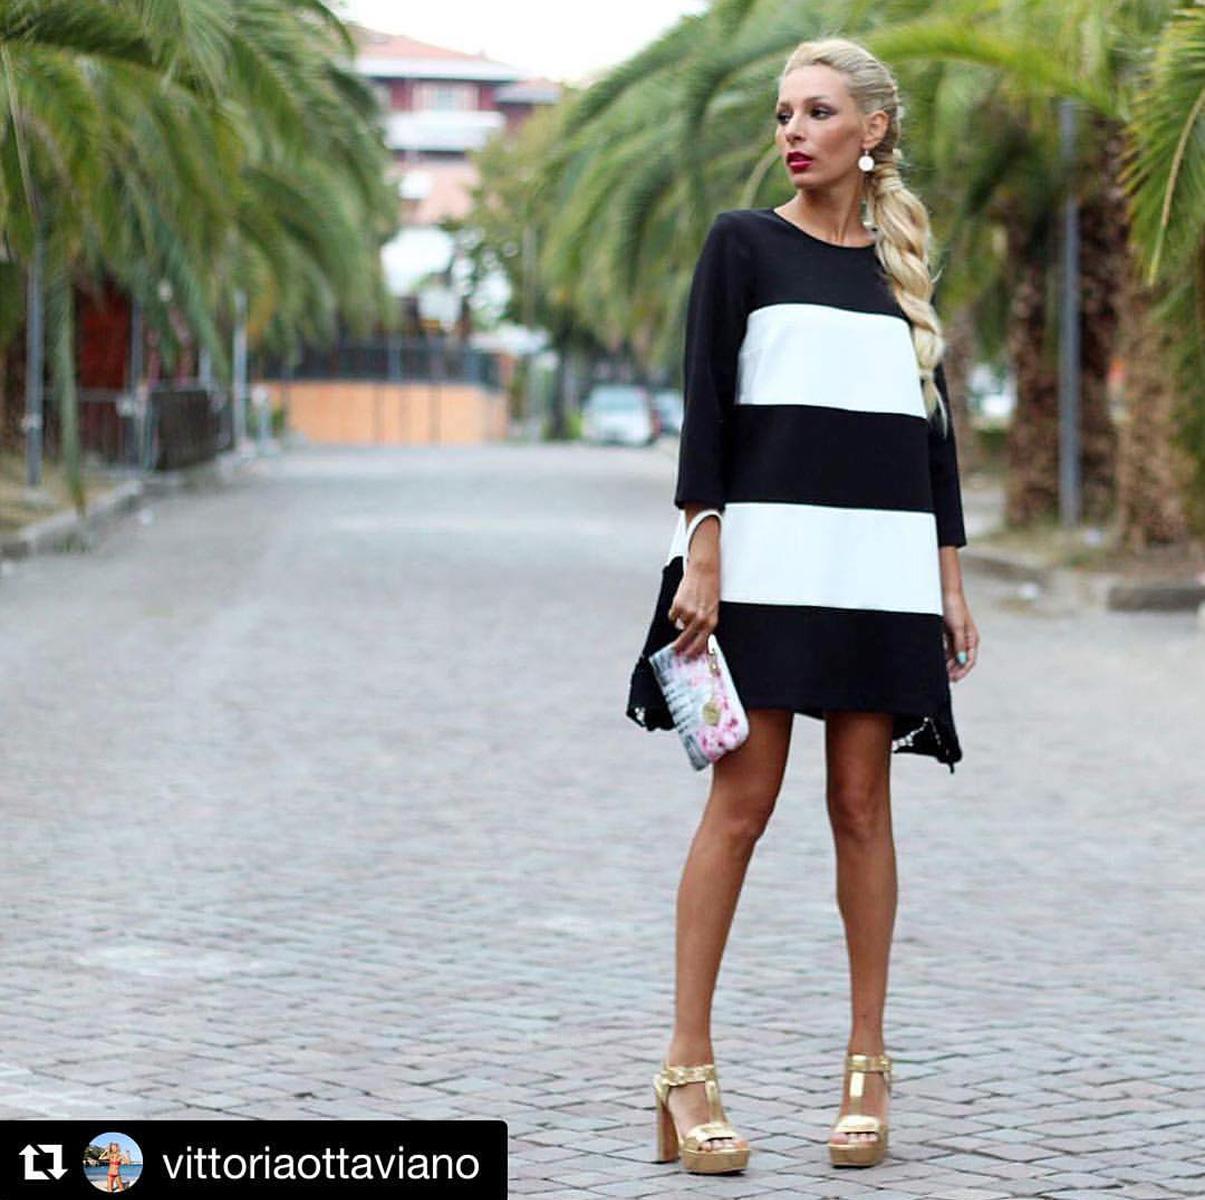 Vittoria Ottaviano wears Princesse Metropolitaine